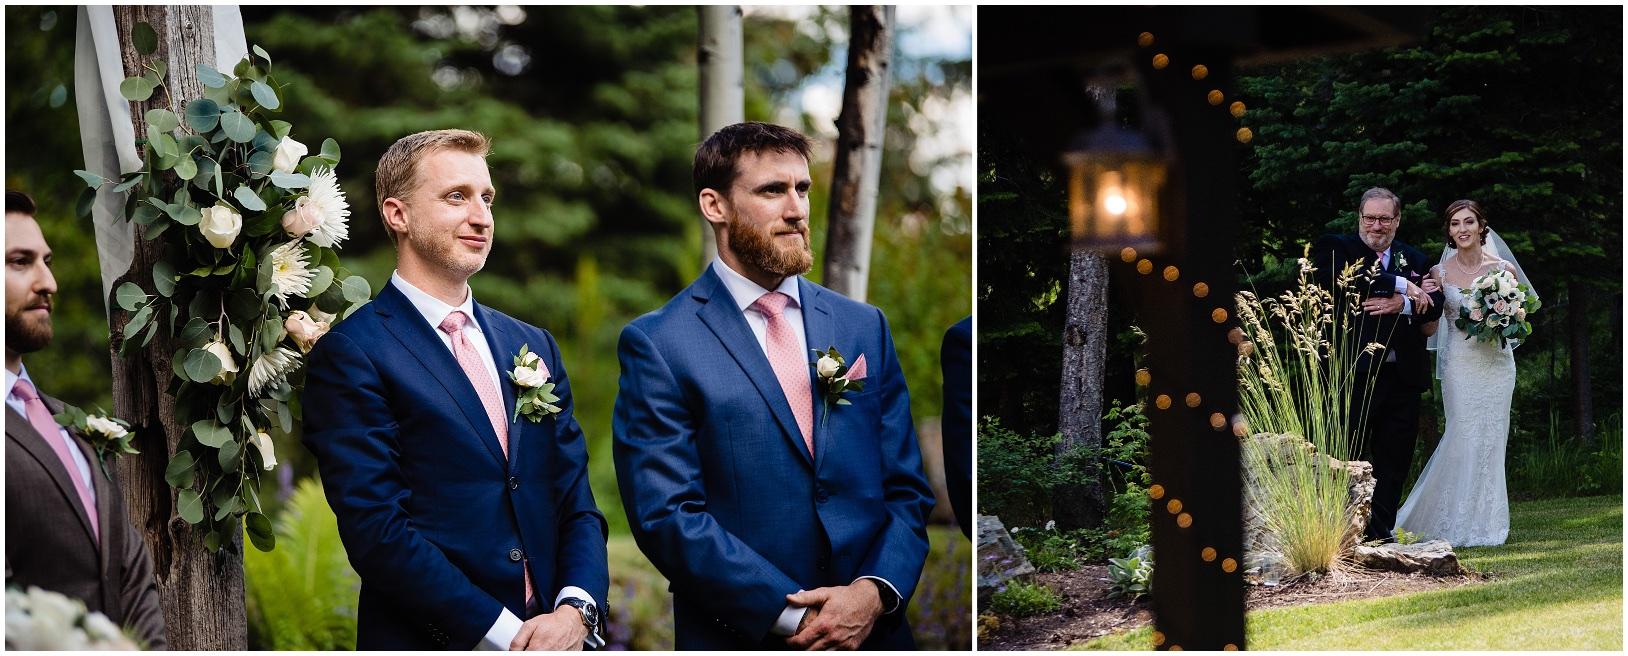 lindseyjanephoto_wedding0054.jpg